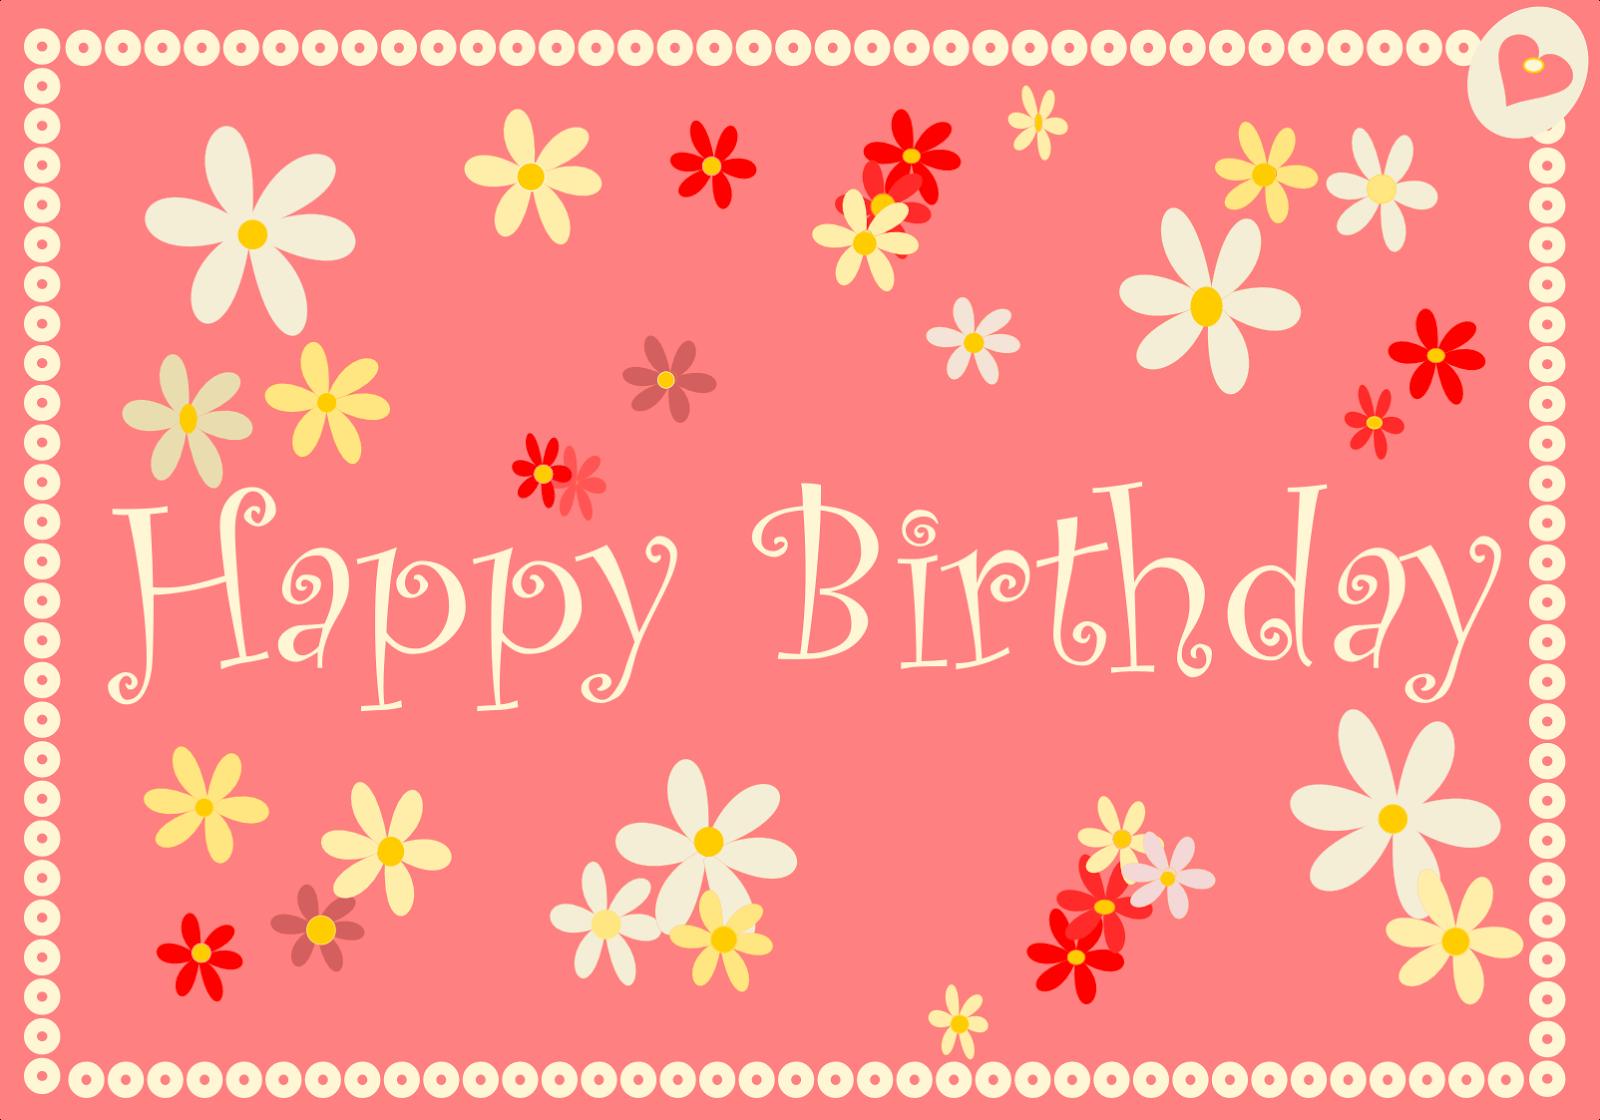 Print A Free Birthday Card stevejobssecretsoflifeorg – Free Birthday Cards to Print